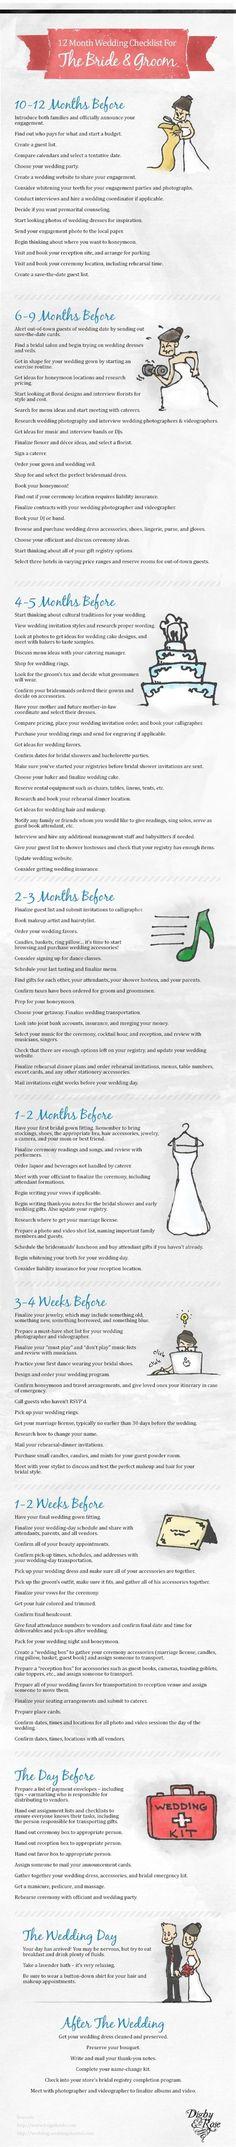 12 month wedding to-do list! | Postris